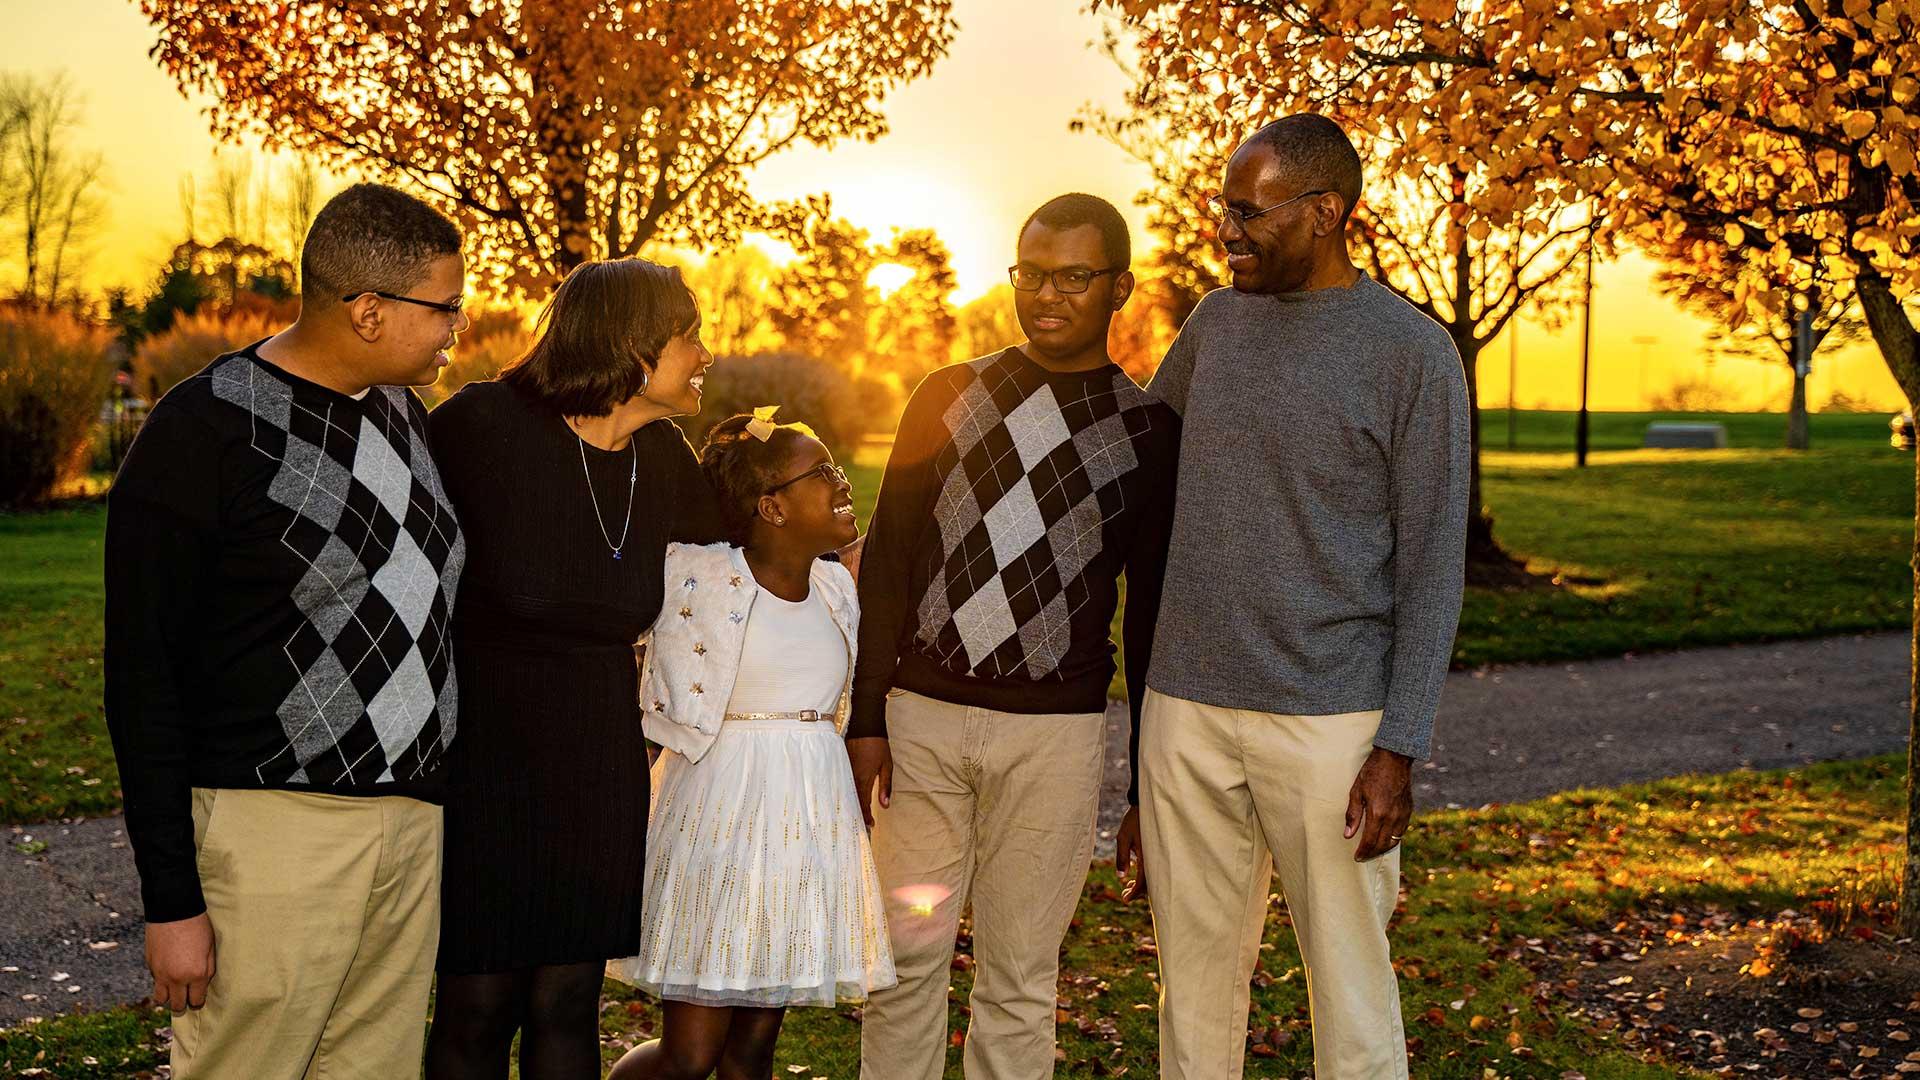 photography family portrait sunset